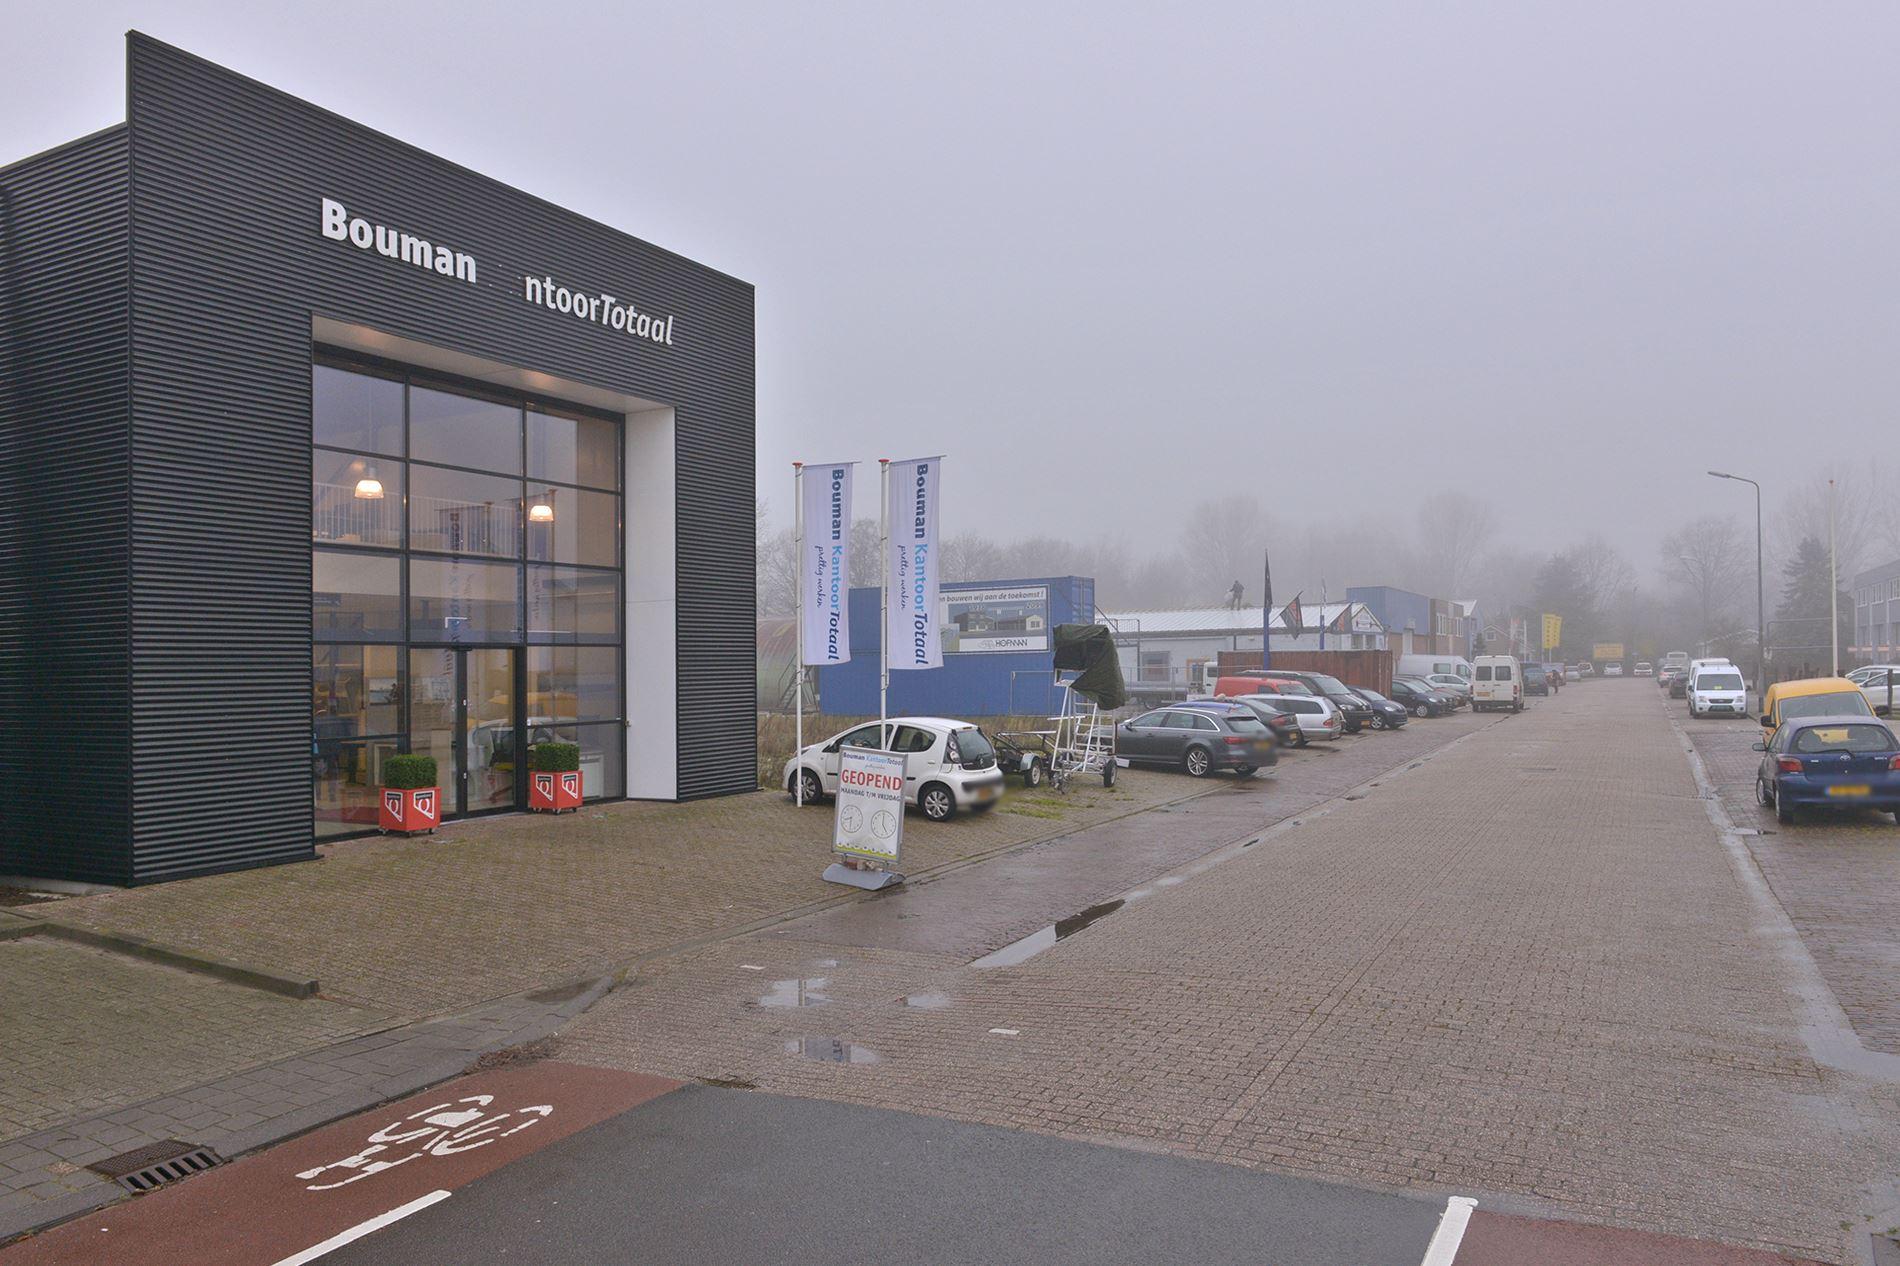 Bouman Kantoor Totaal : Pci nederland neemt bouman kantoortotaal over lexence